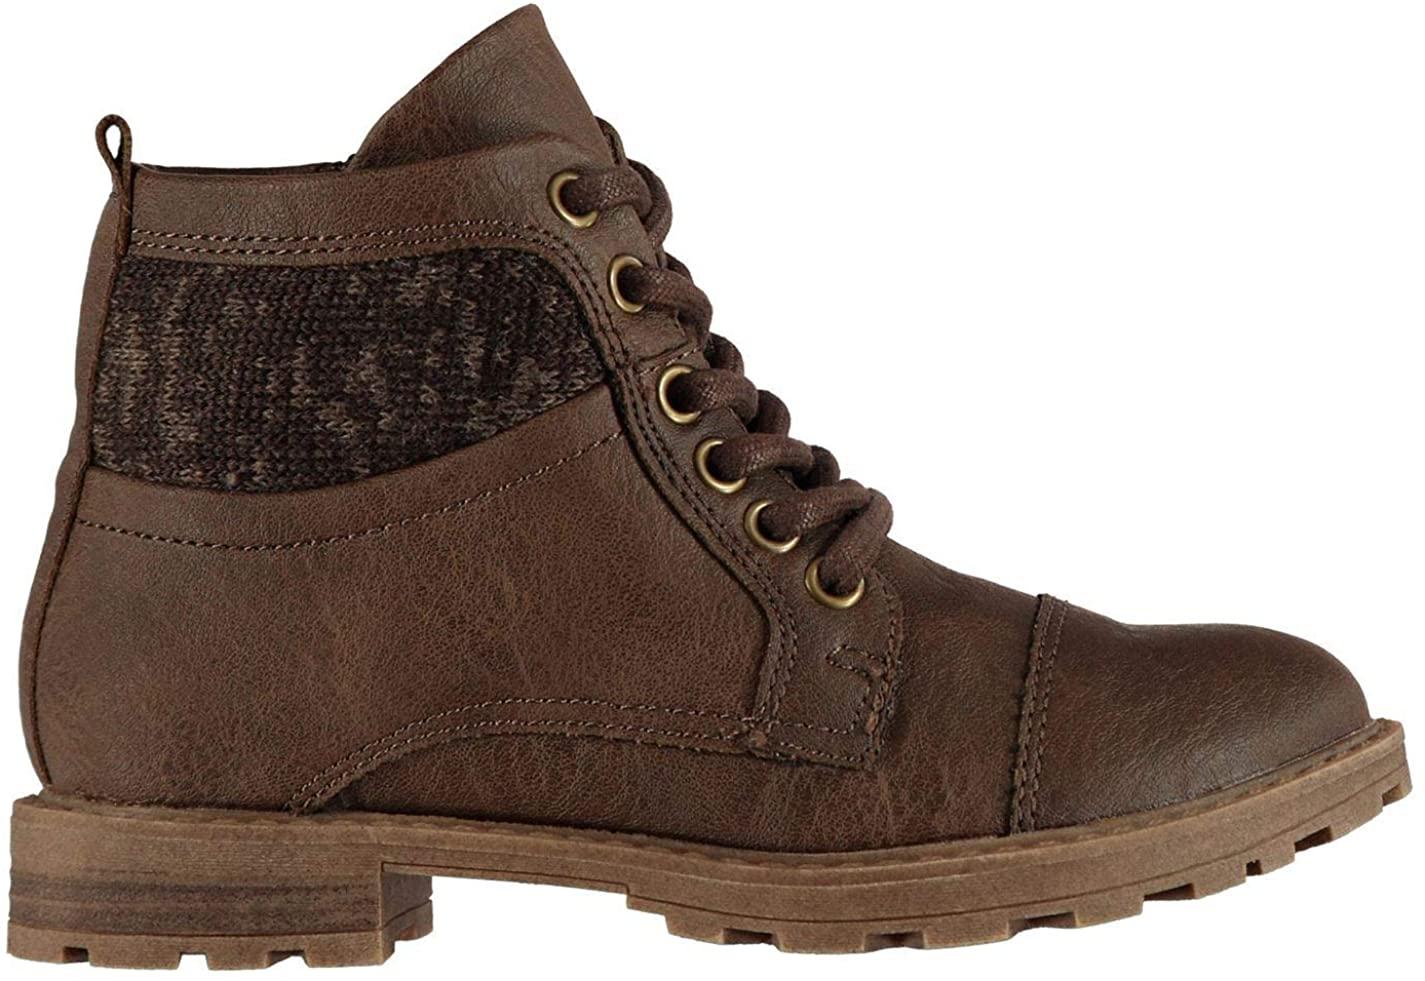 Soviet Nelson Boots Childs Boys Brown Shoes Boot Kids Footwear (UKC11) (EU29)